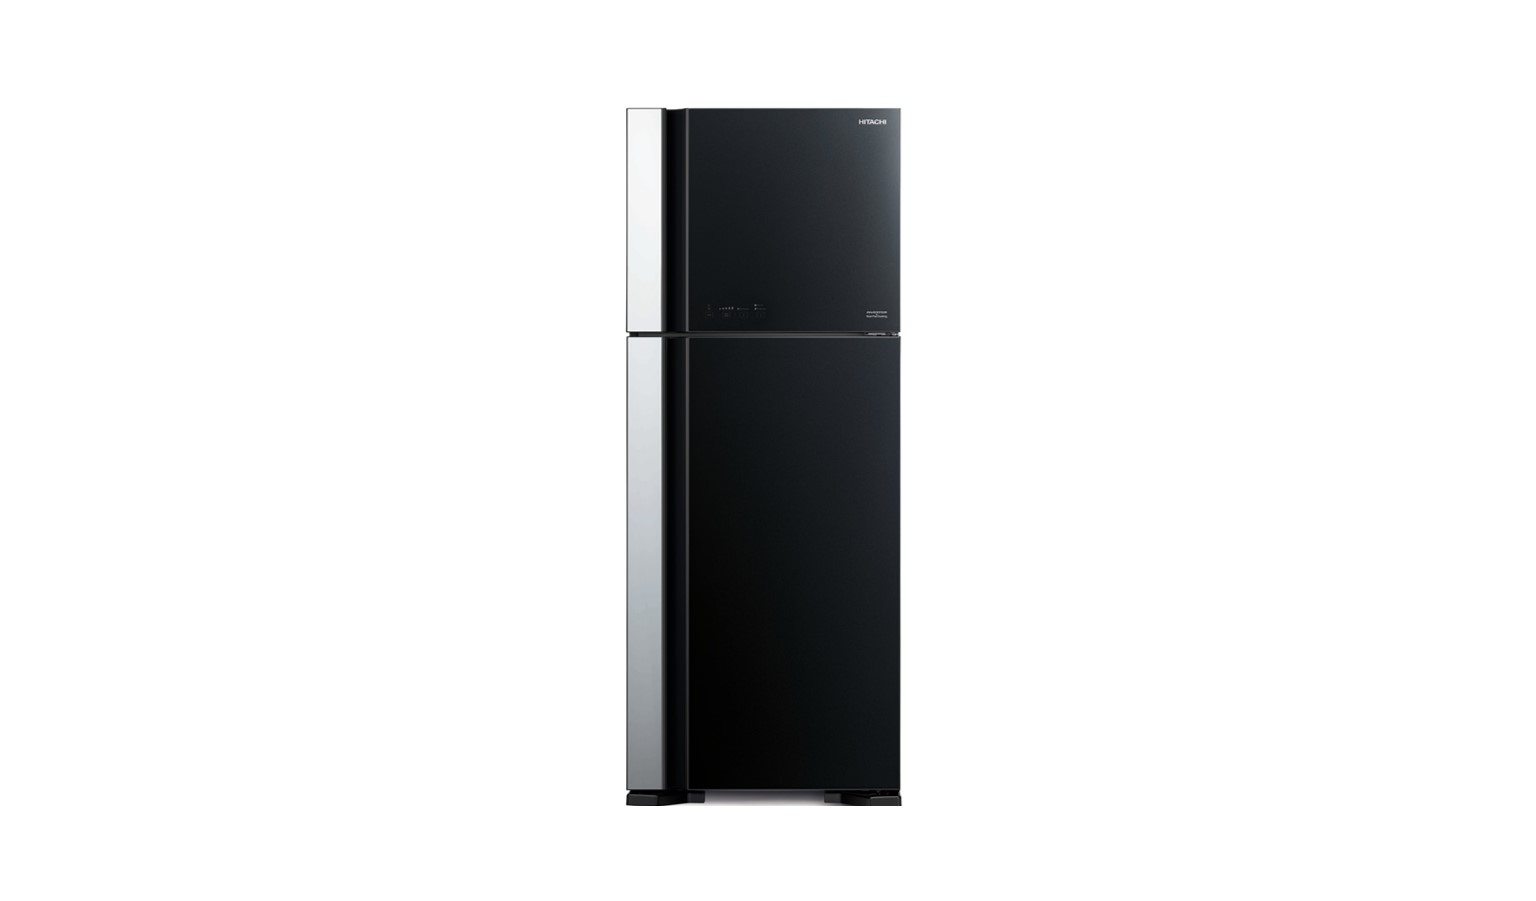 Hitachi R-VG580P7M-1 GBK 489L 2 Door Fridge - Glass Black